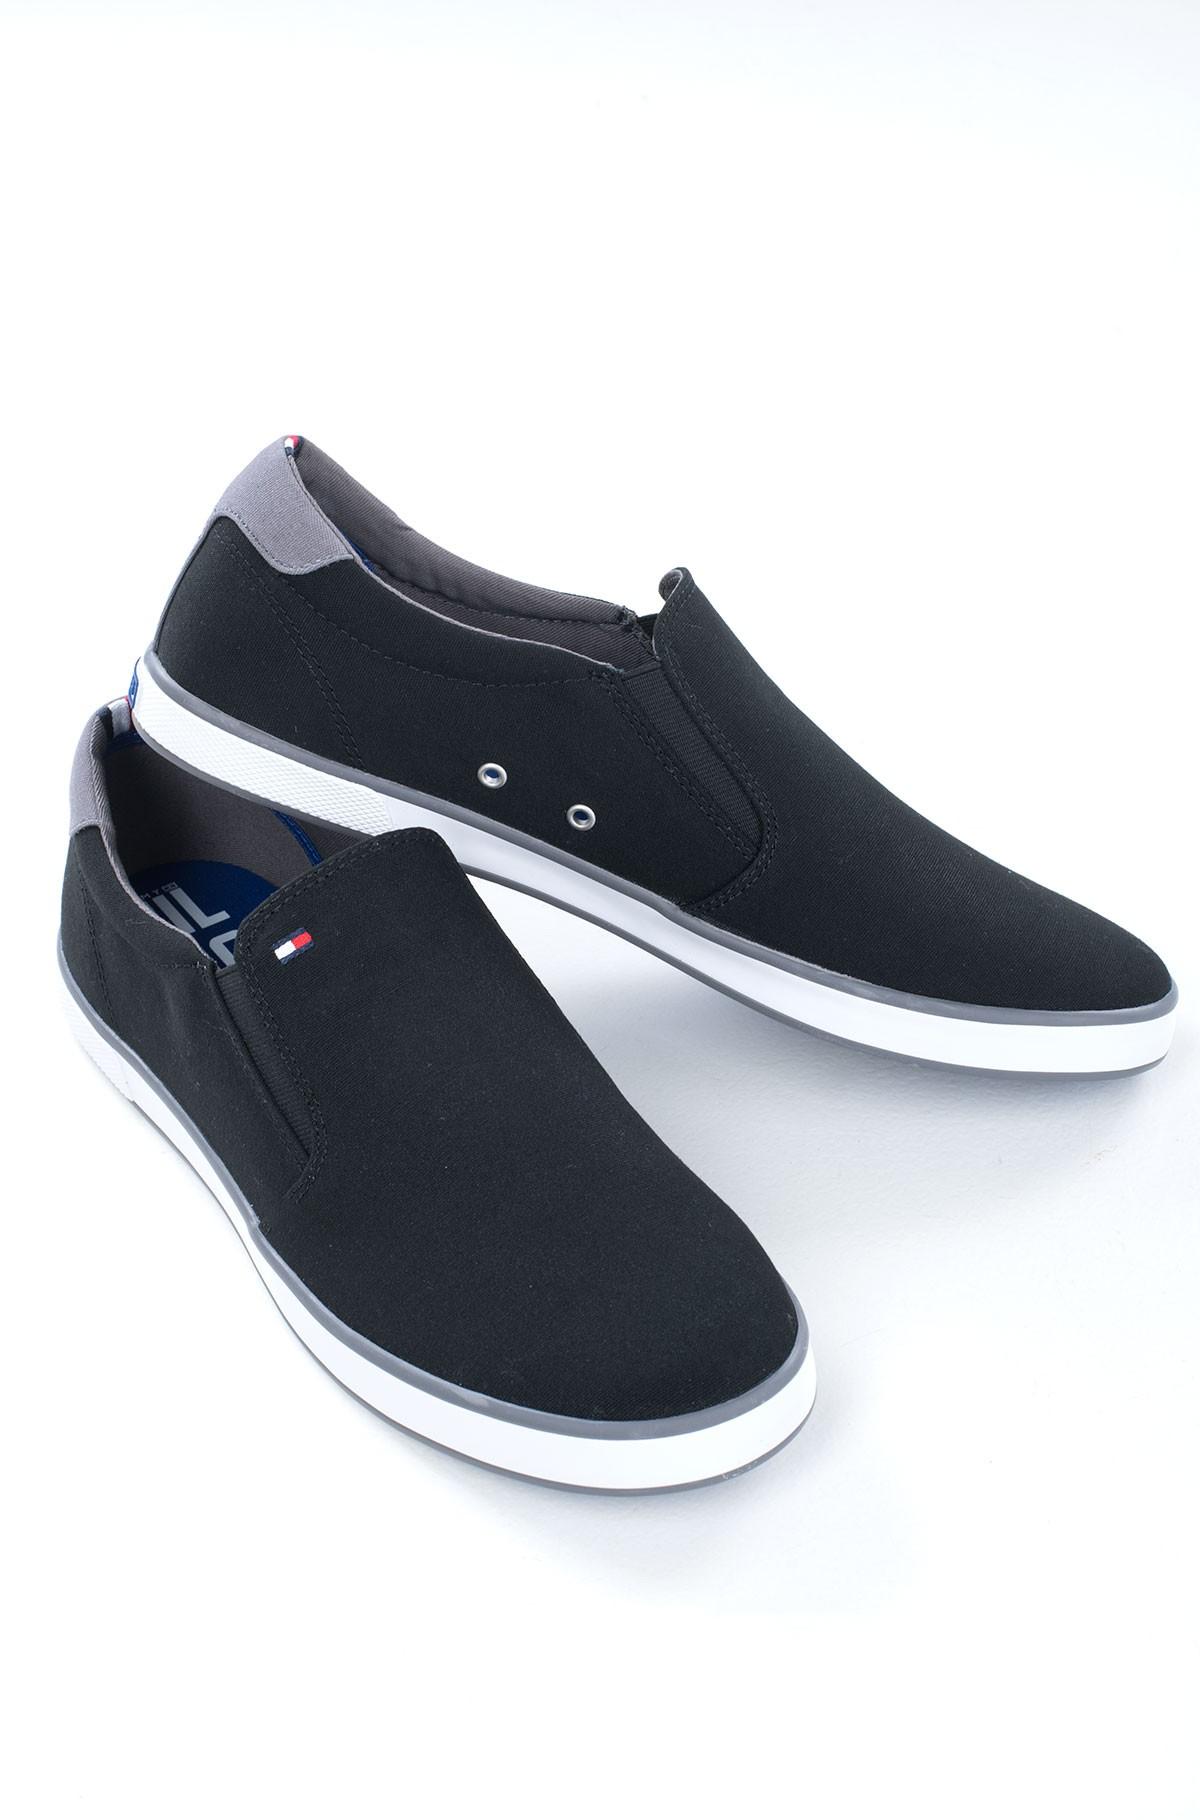 Sneakers Iconic Slip On Sneak-full-1